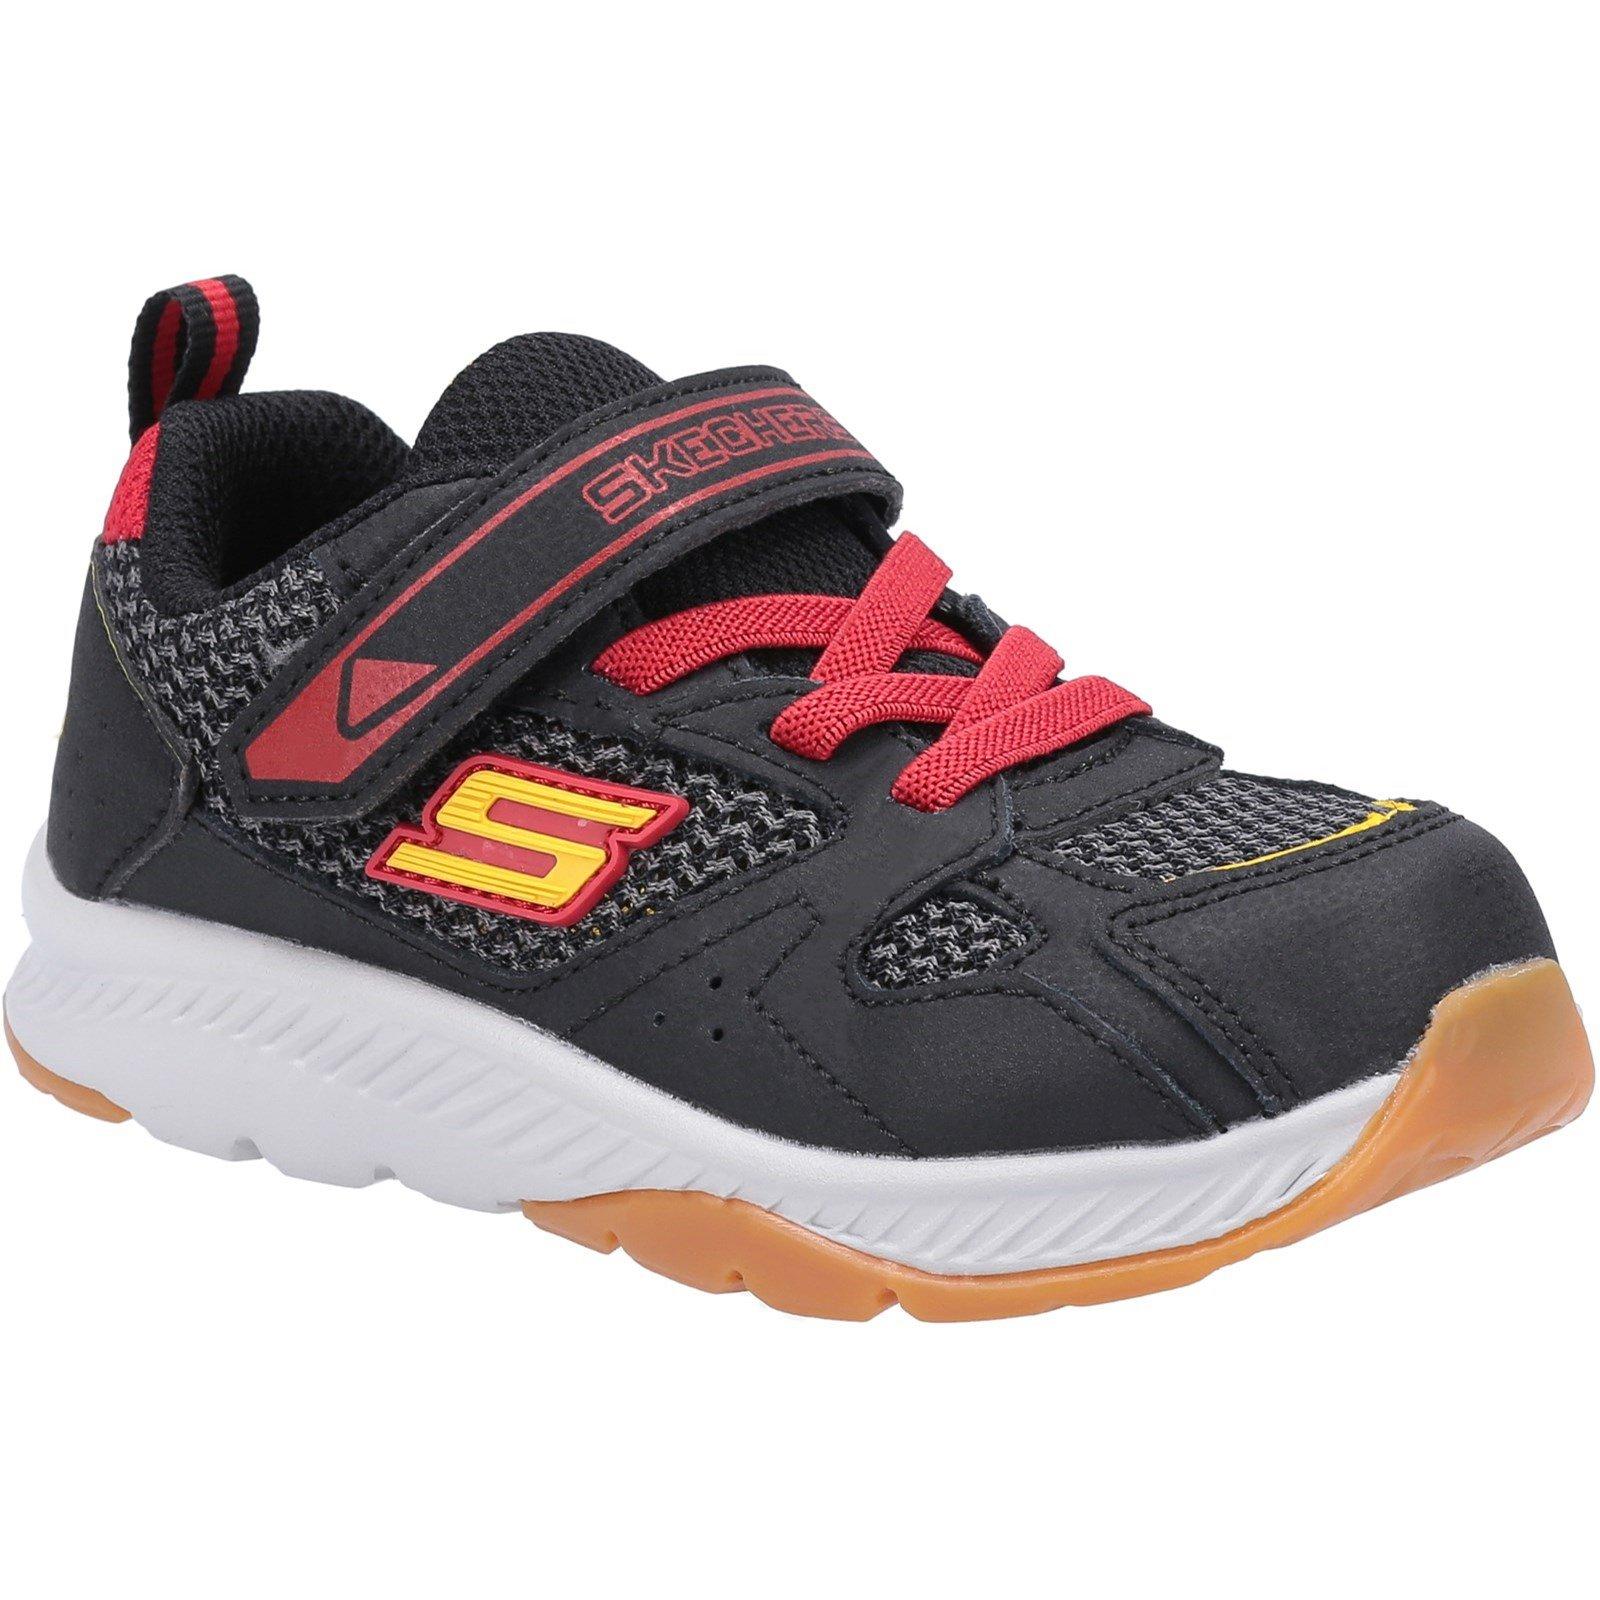 Skechers Kid's Comfy Grip Trainer Multicolor 30424 - Black/Red 7